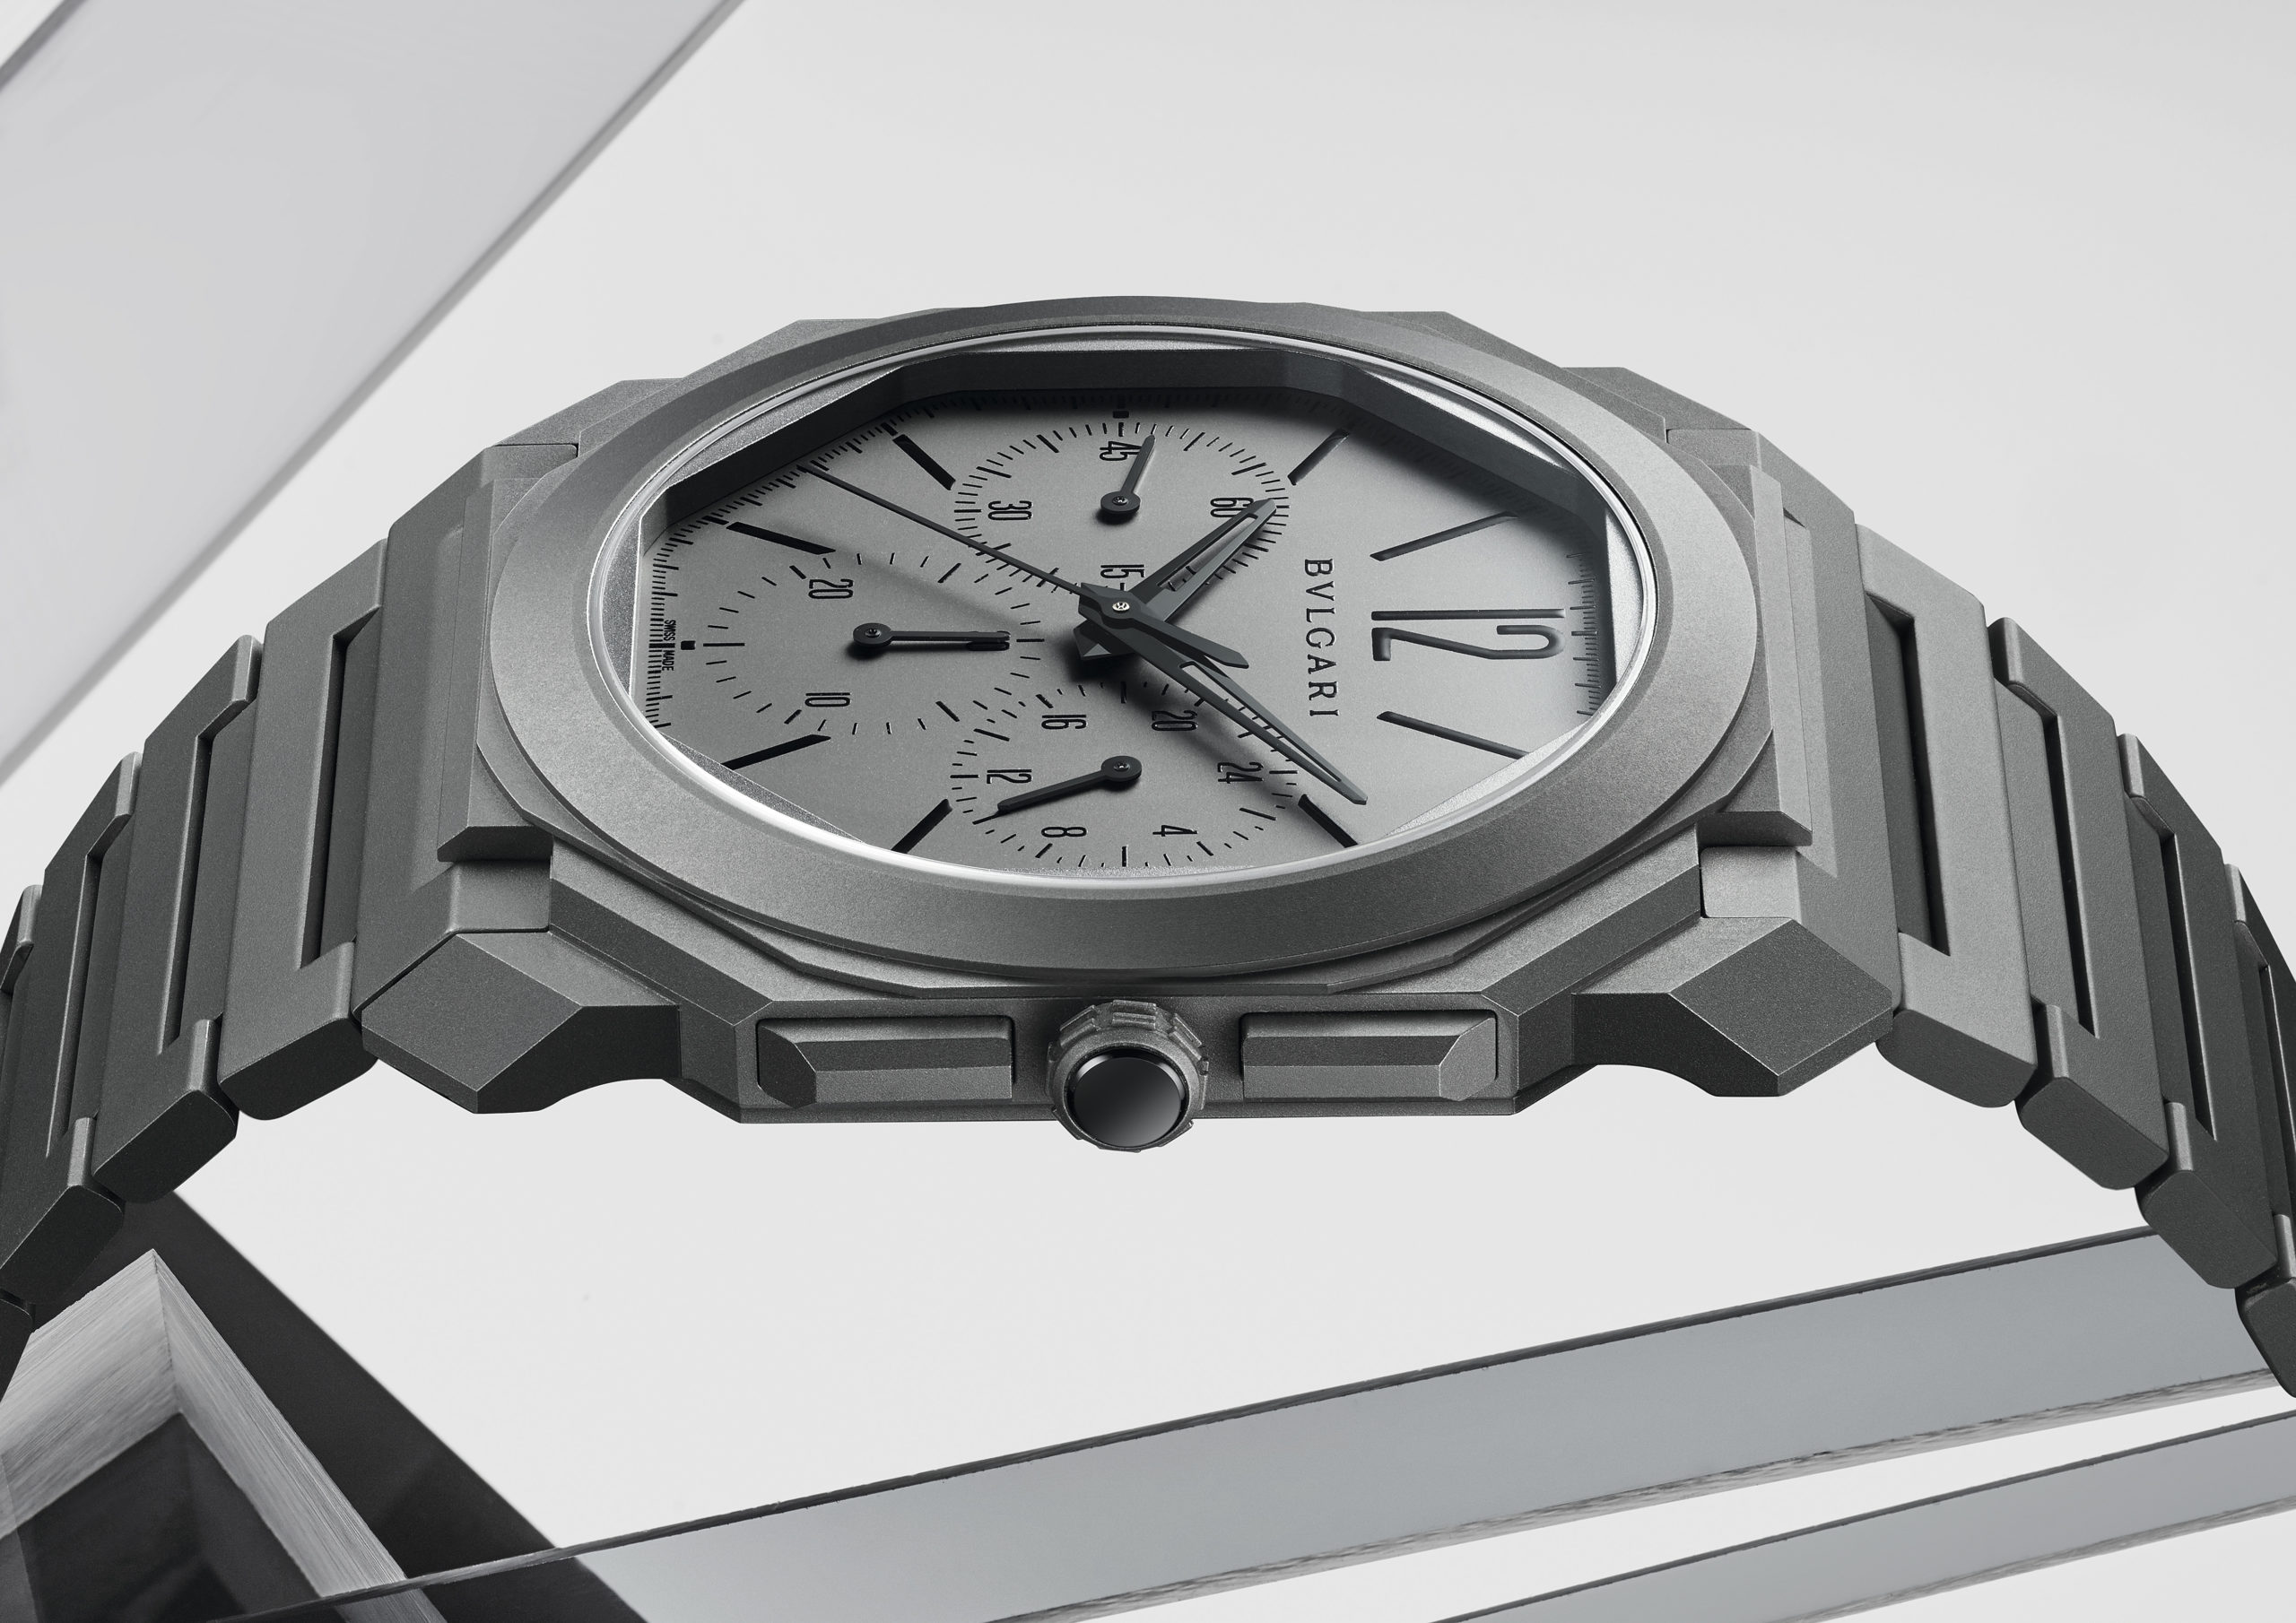 Bvlgari Octo Finissimo Chronograph GMT Automatic 03